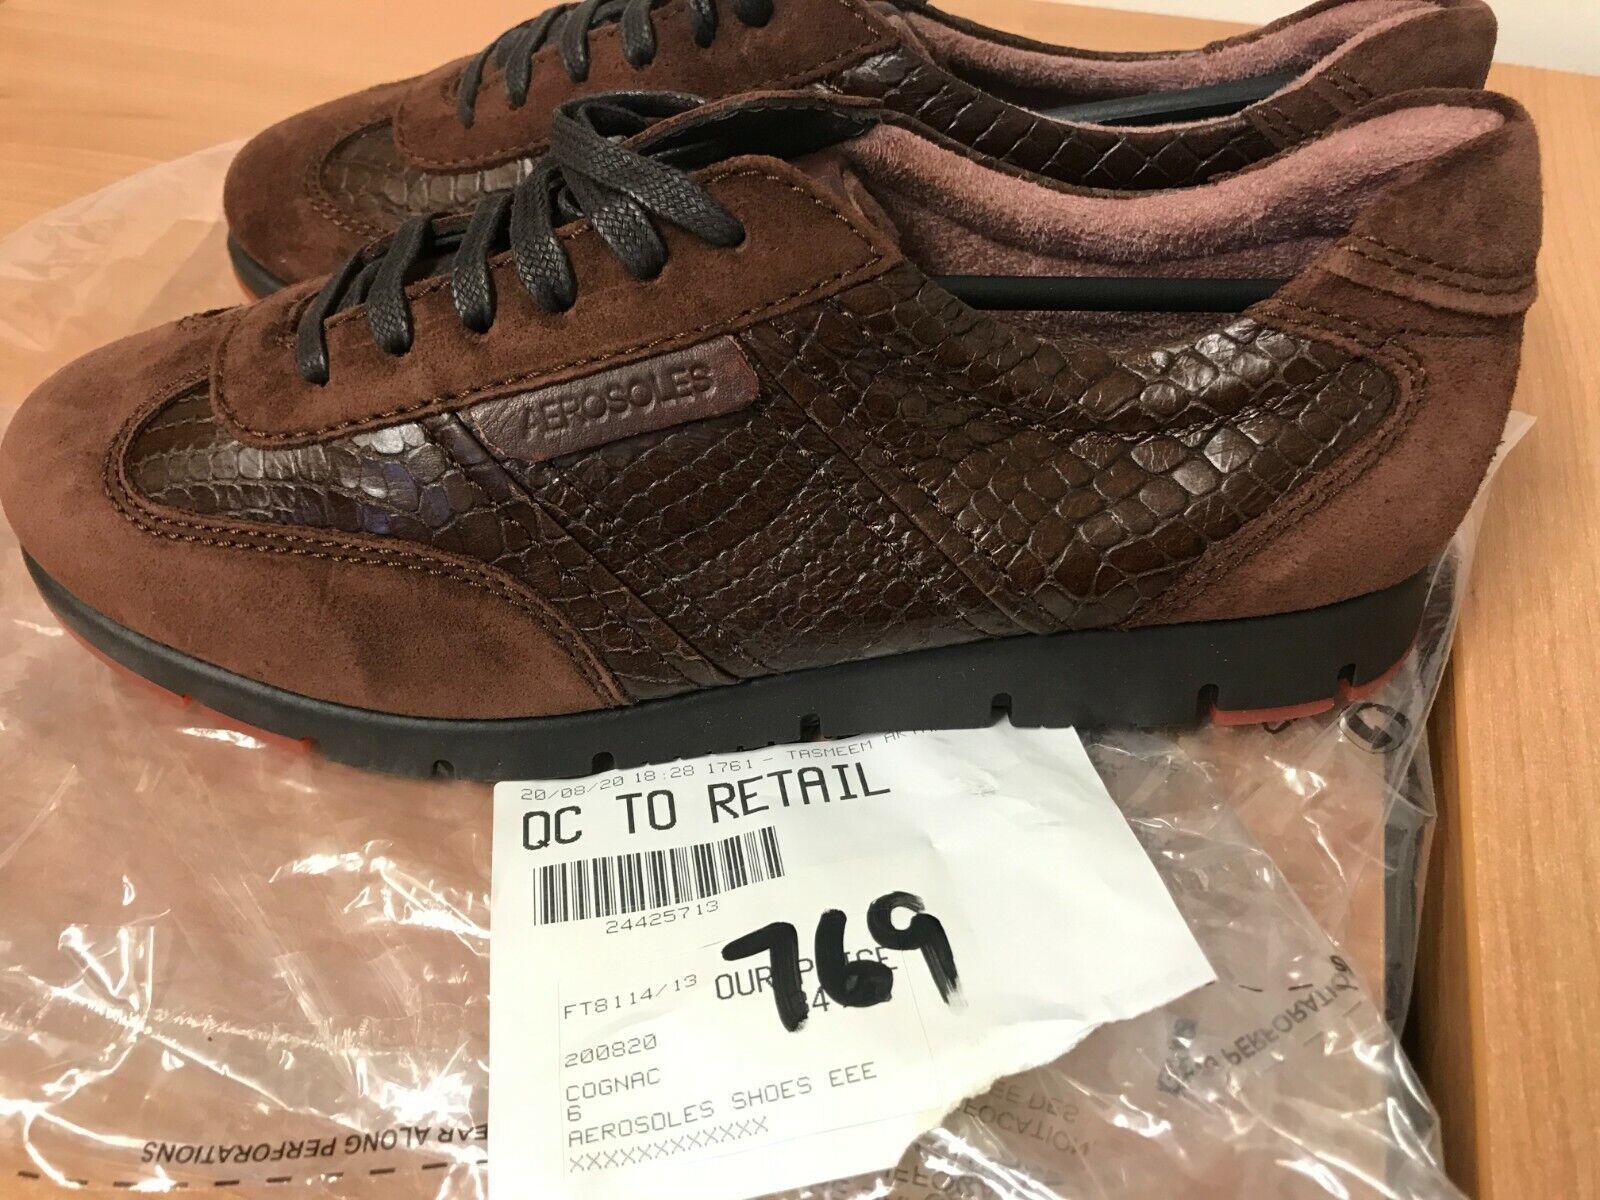 Aerosoles Shoes Wide EEE Fit in Cognac UK 6 (769)